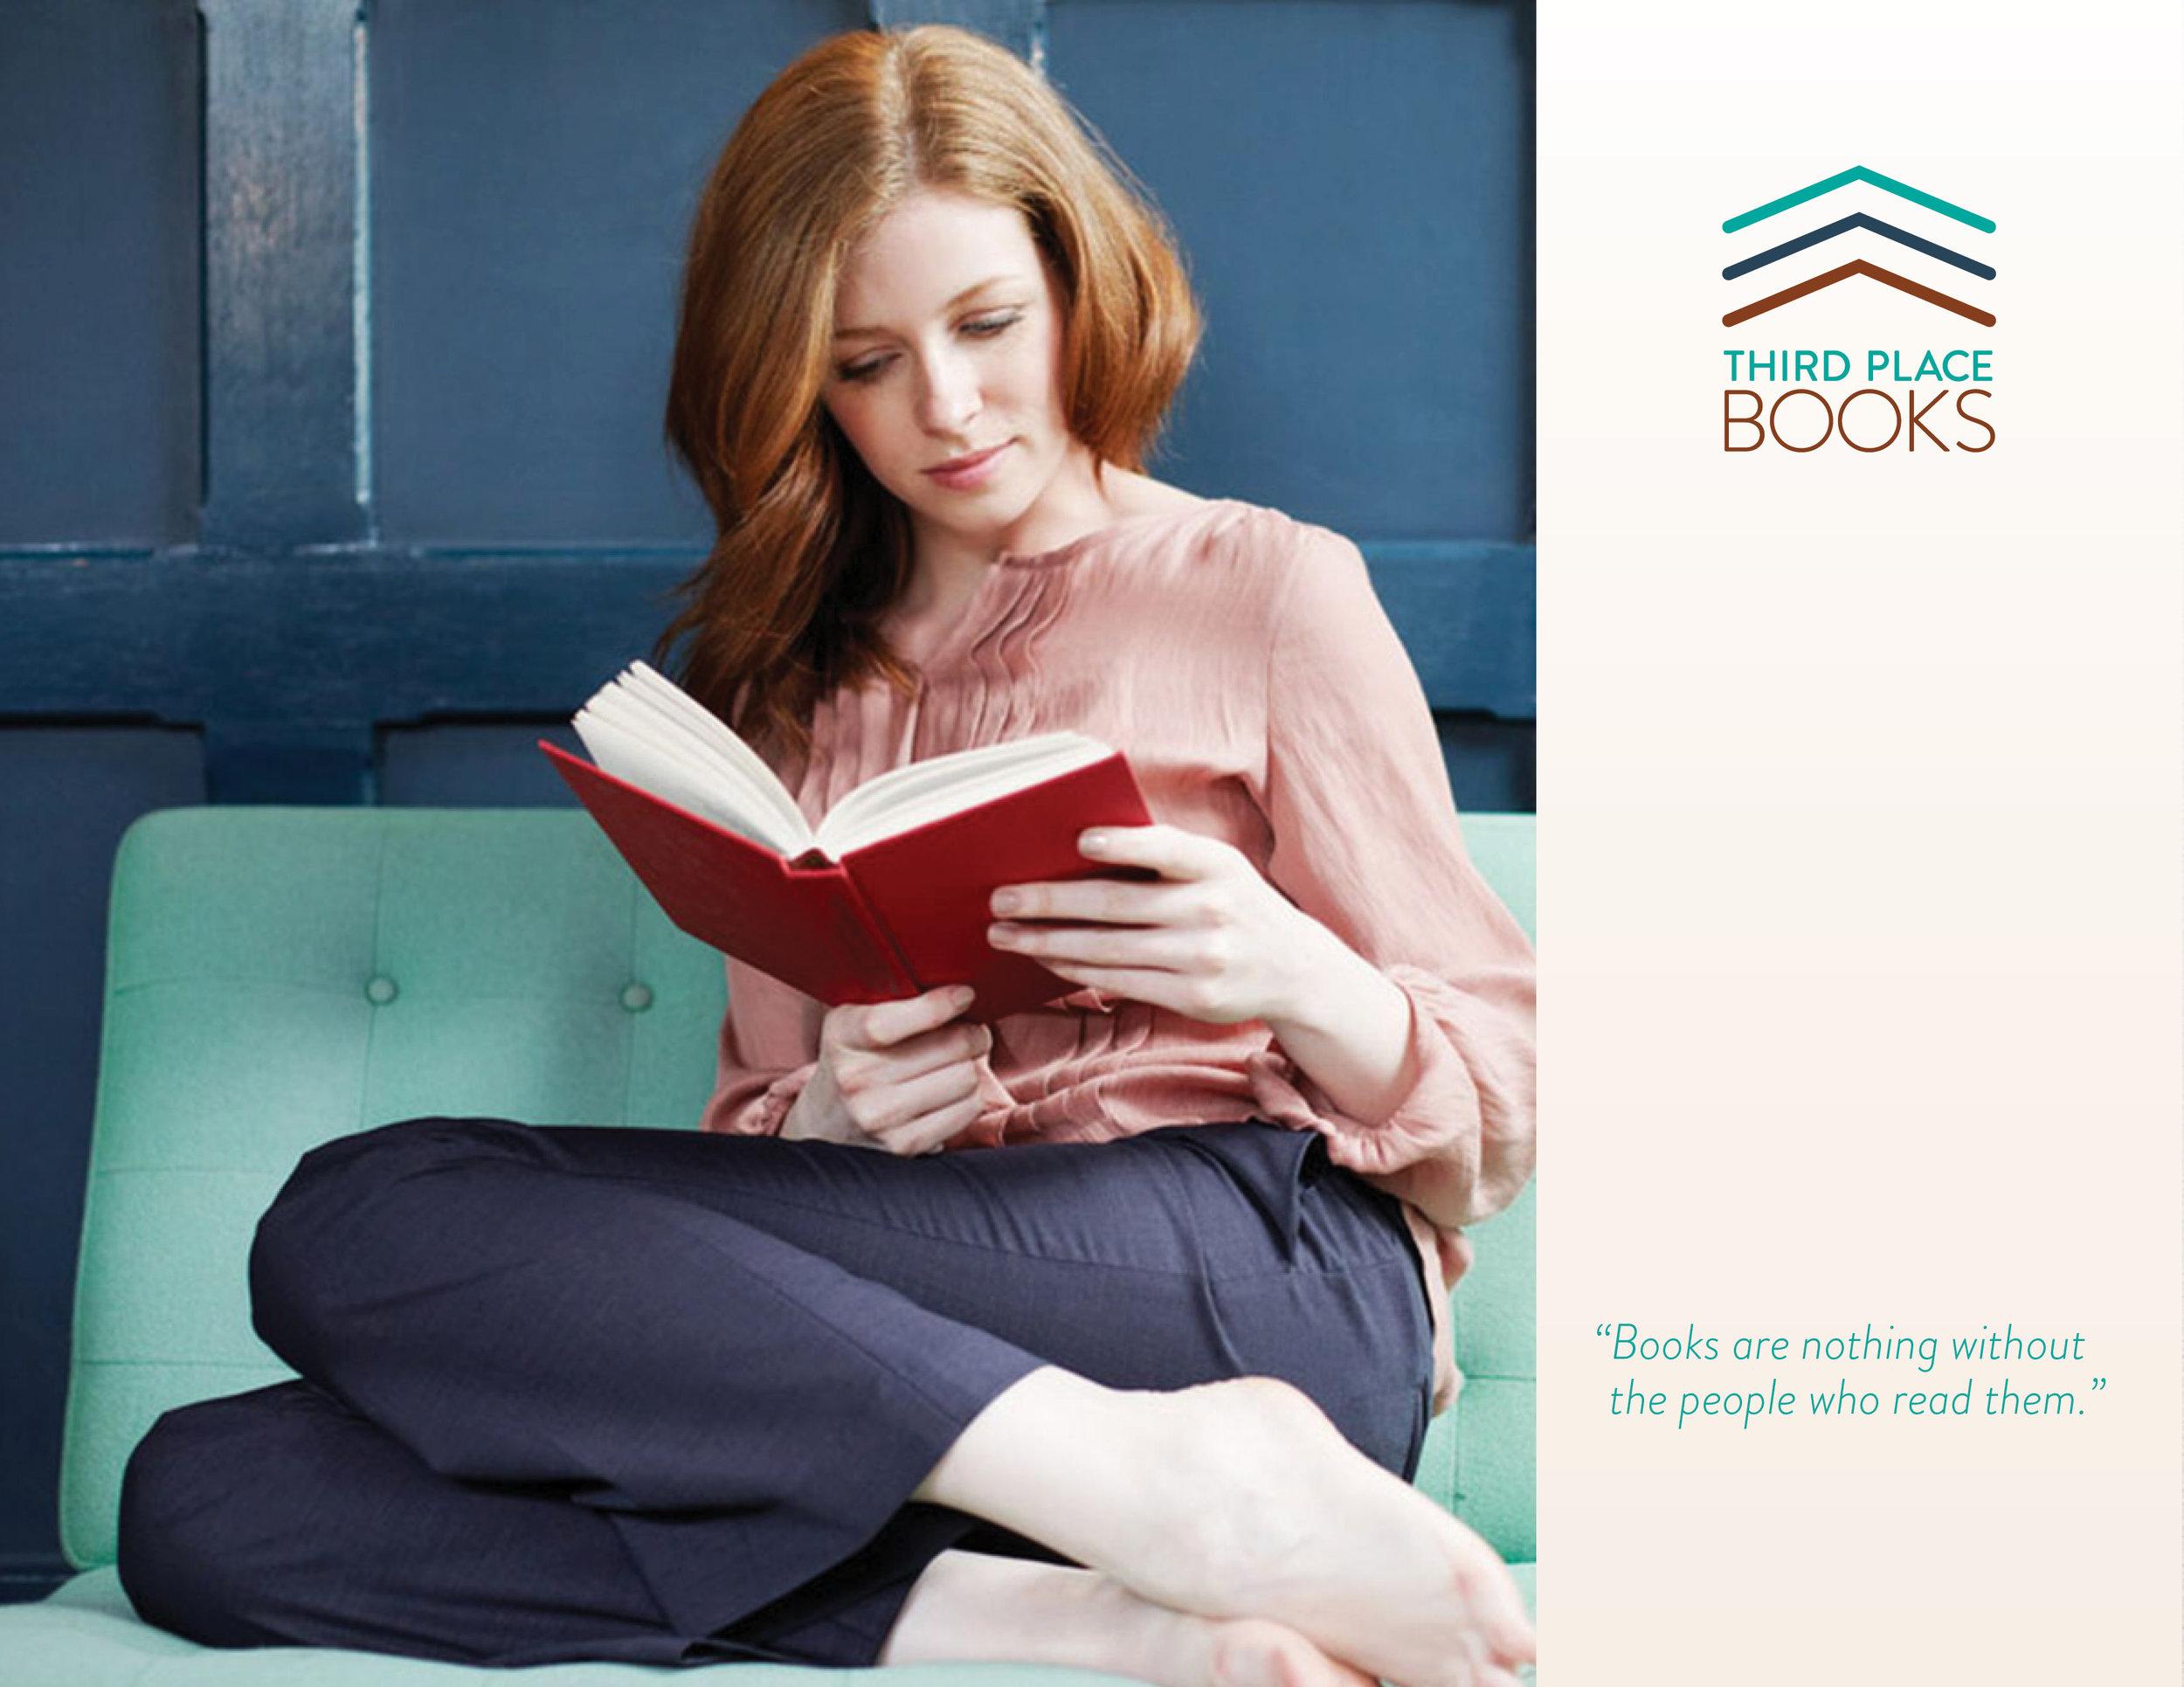 women_reading_tpb_new.jpg